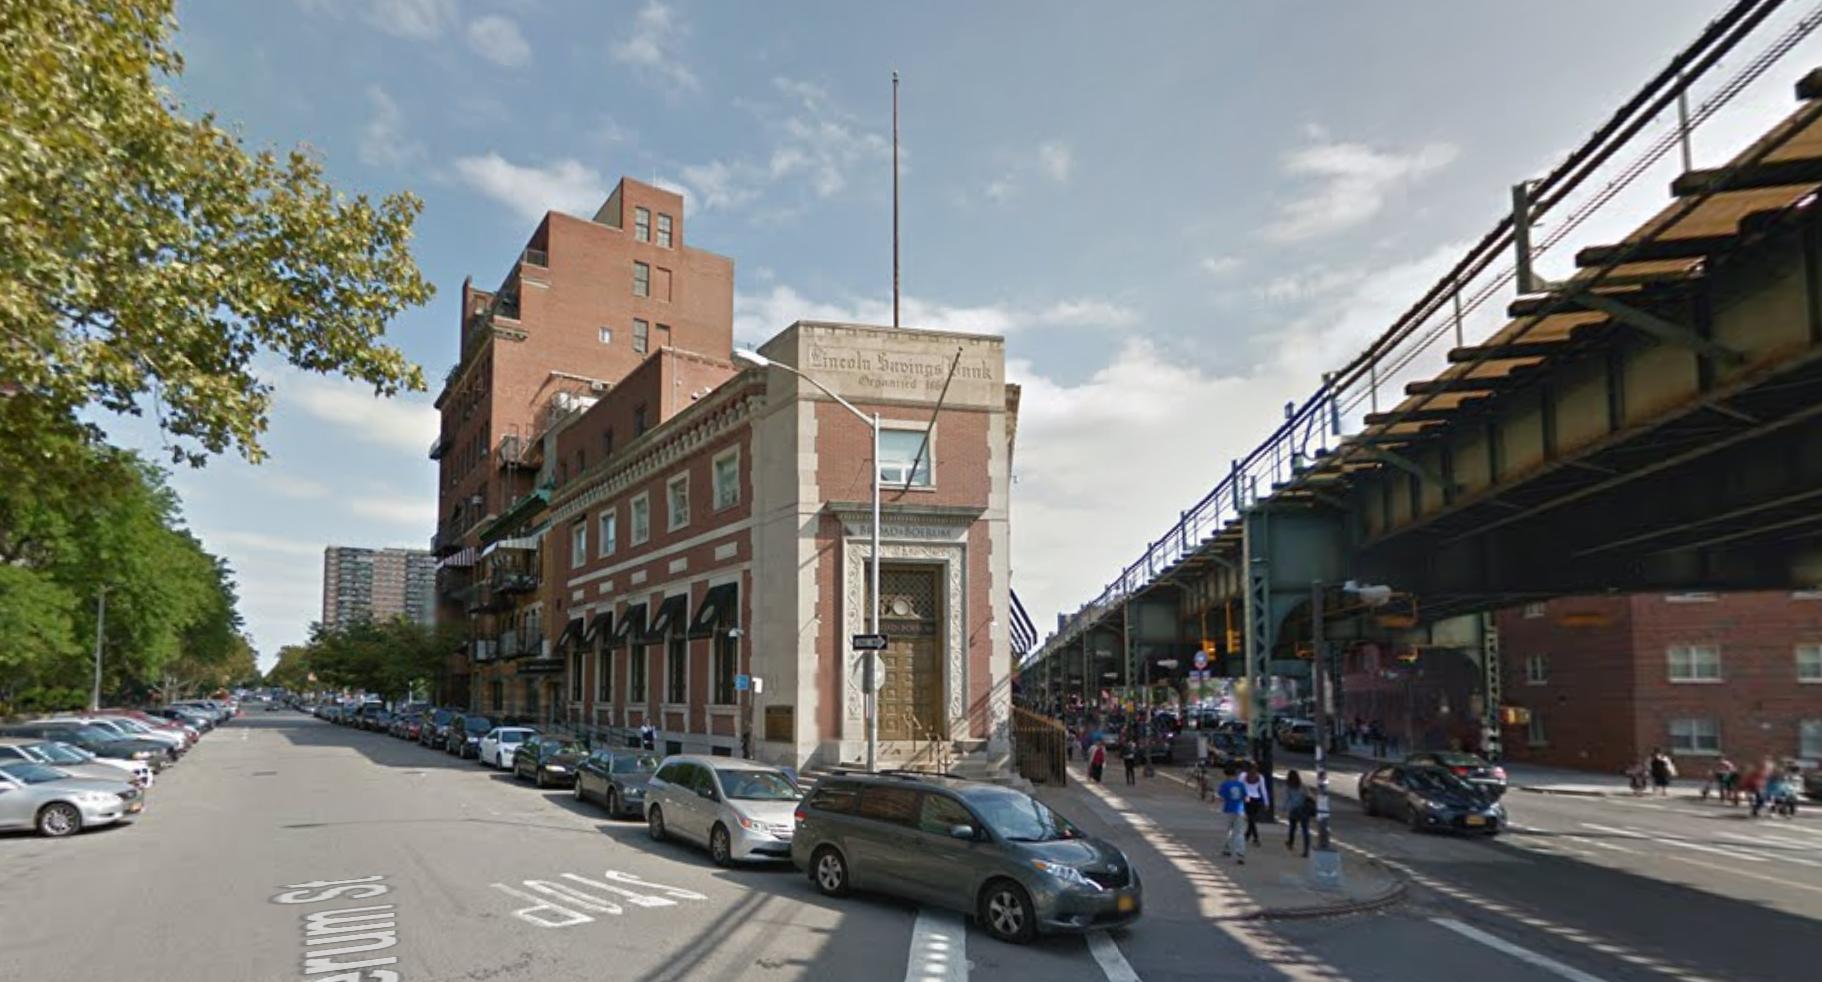 525 Broadway, image via Google Maps